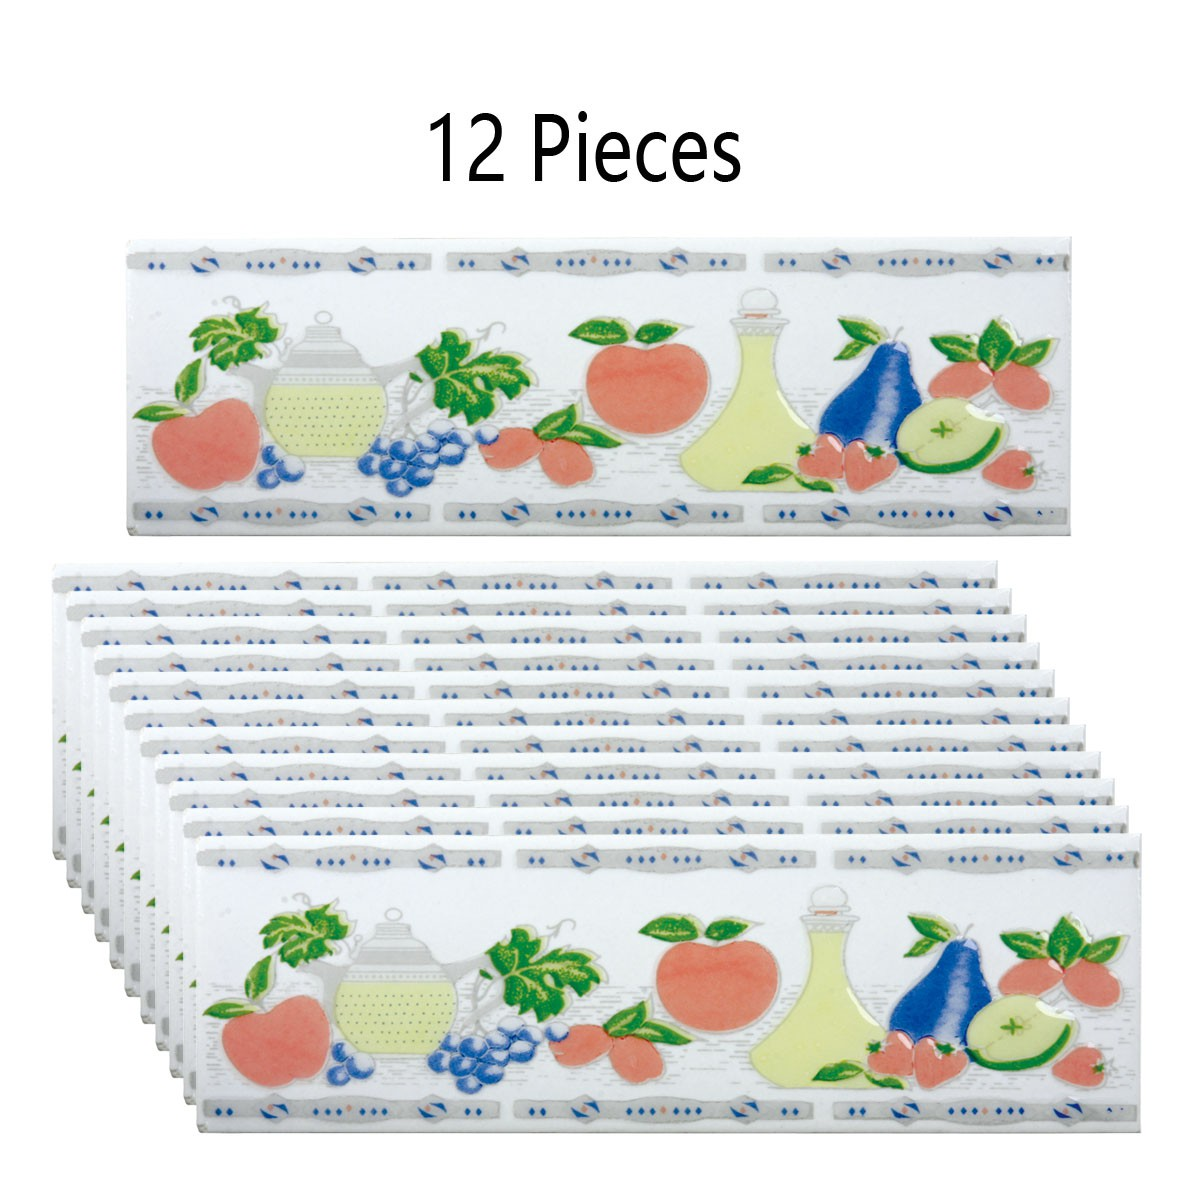 "12 Pcs Ceramic Multi-Colored Tile 3"" x 10"" | Renovator's Supply"